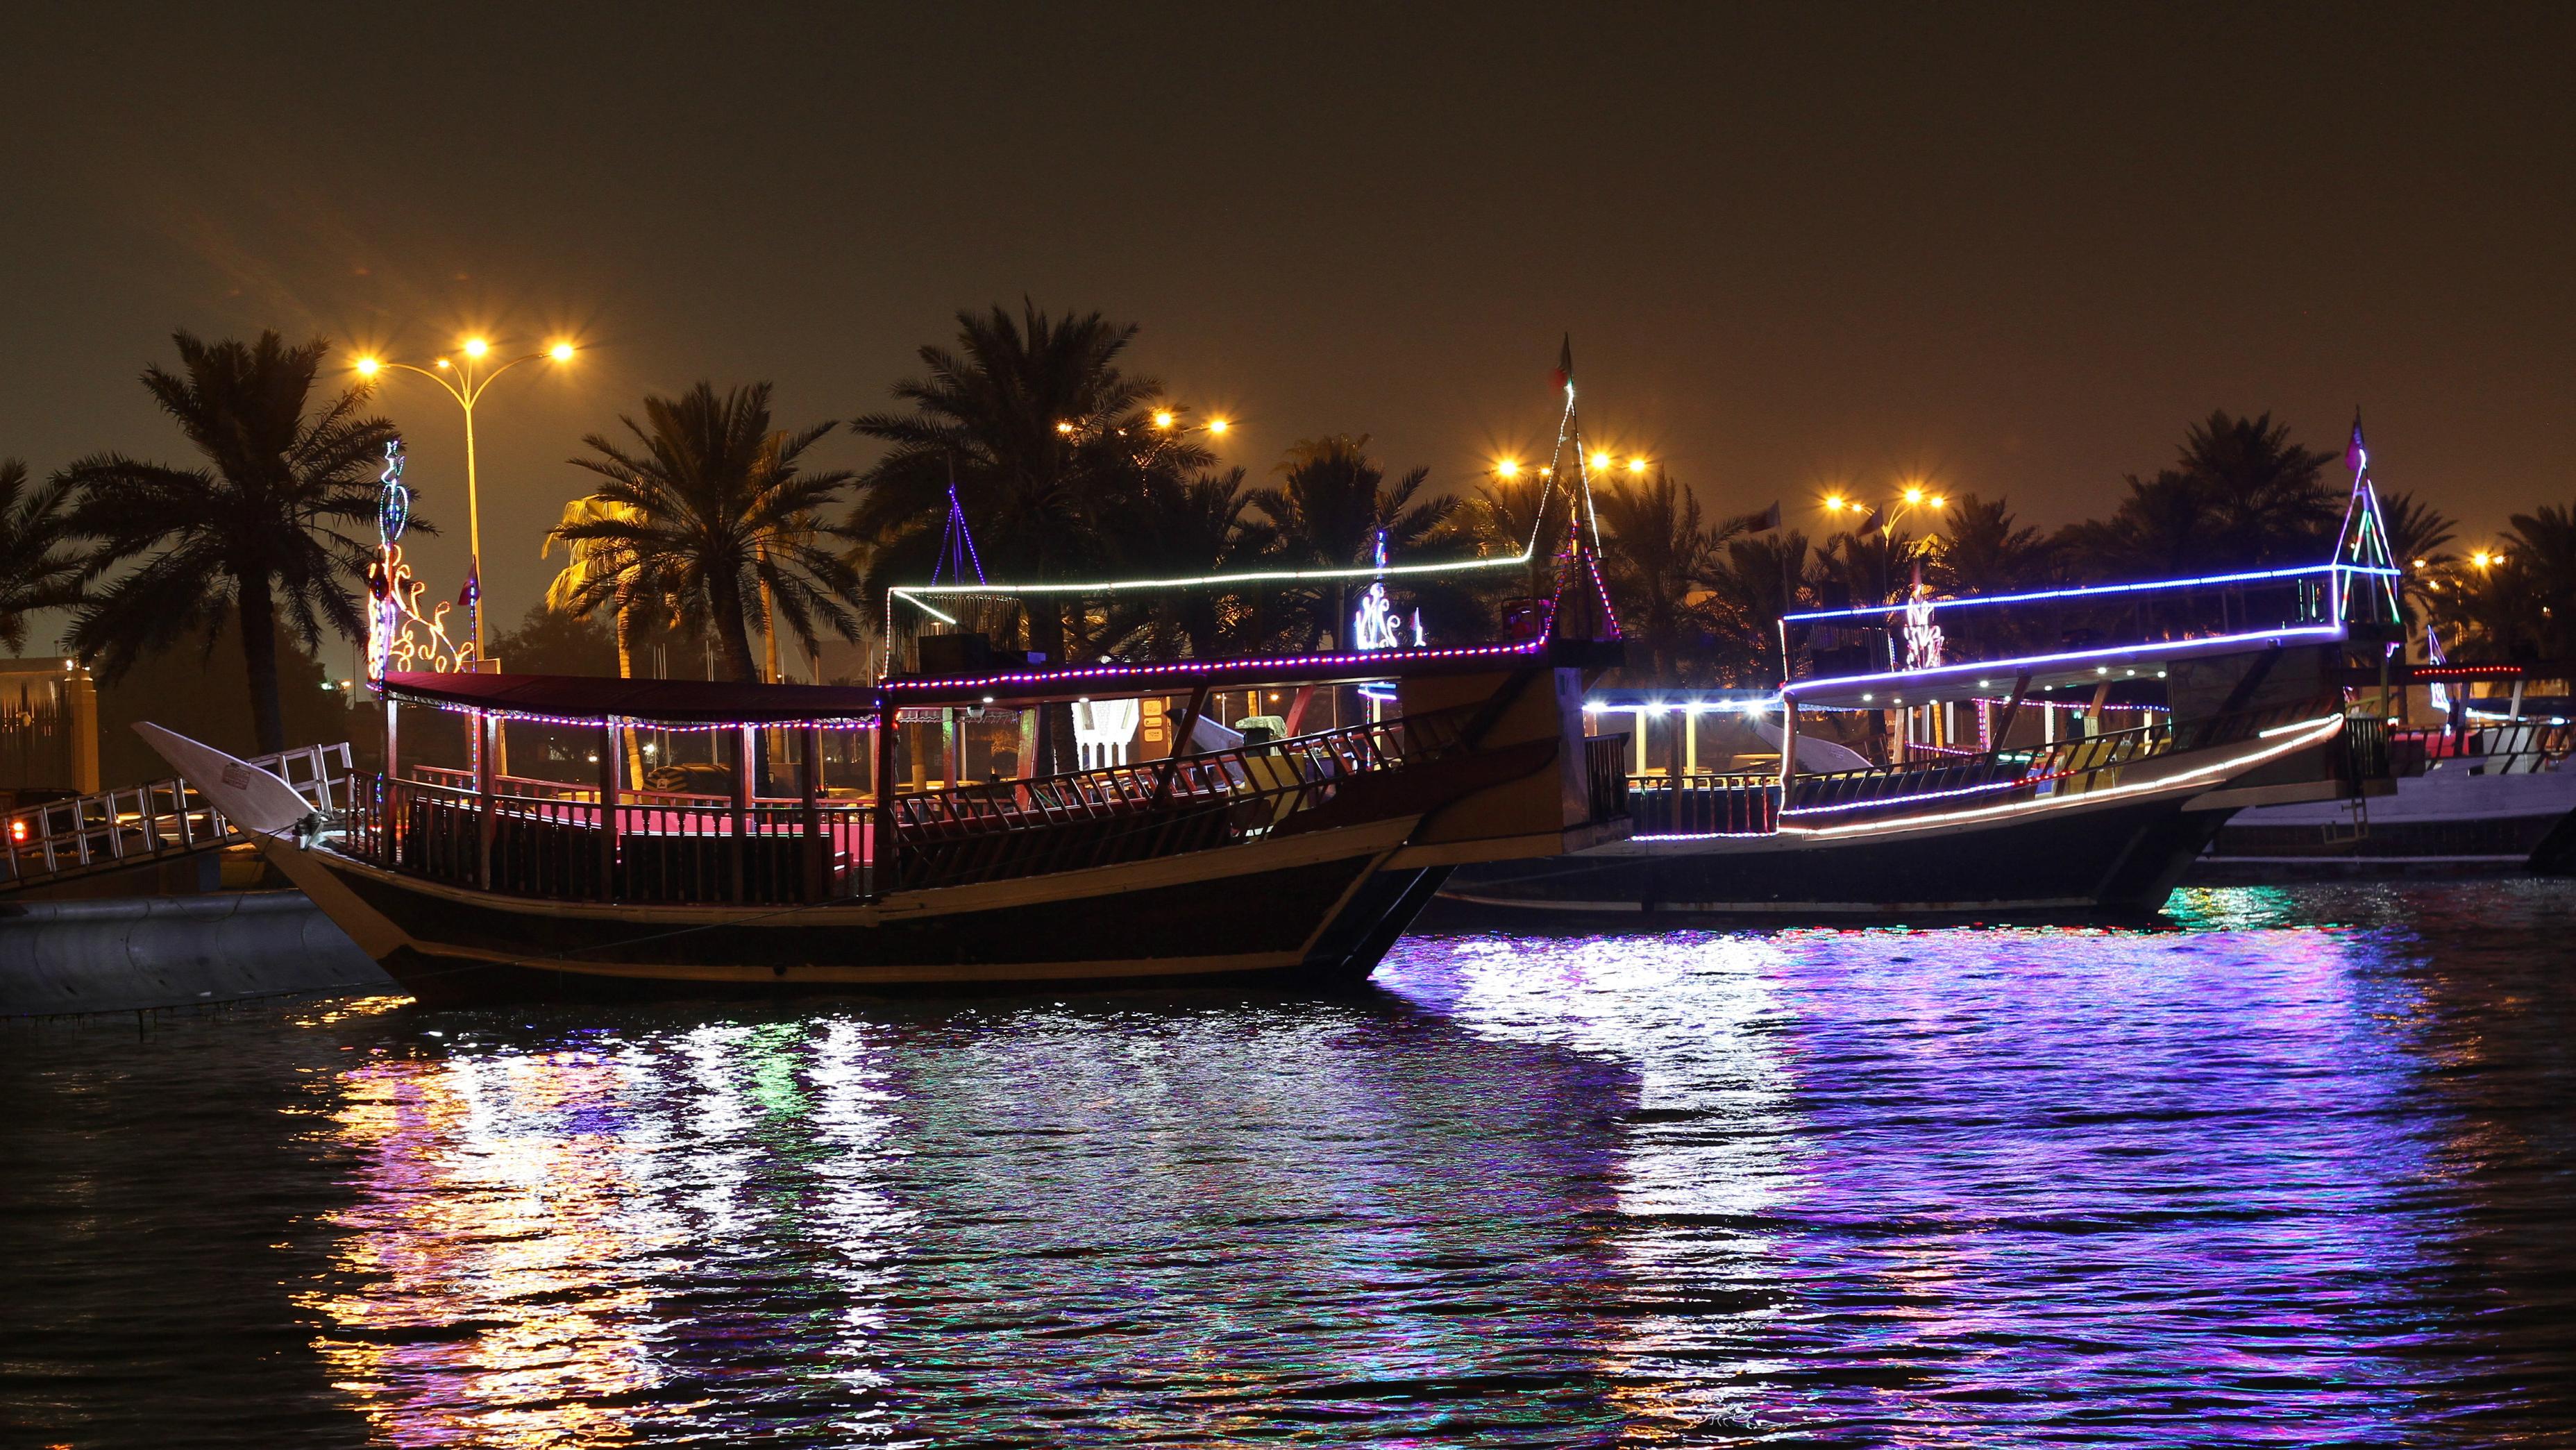 c-boat-RTS179GV-Naseem Zeitoon